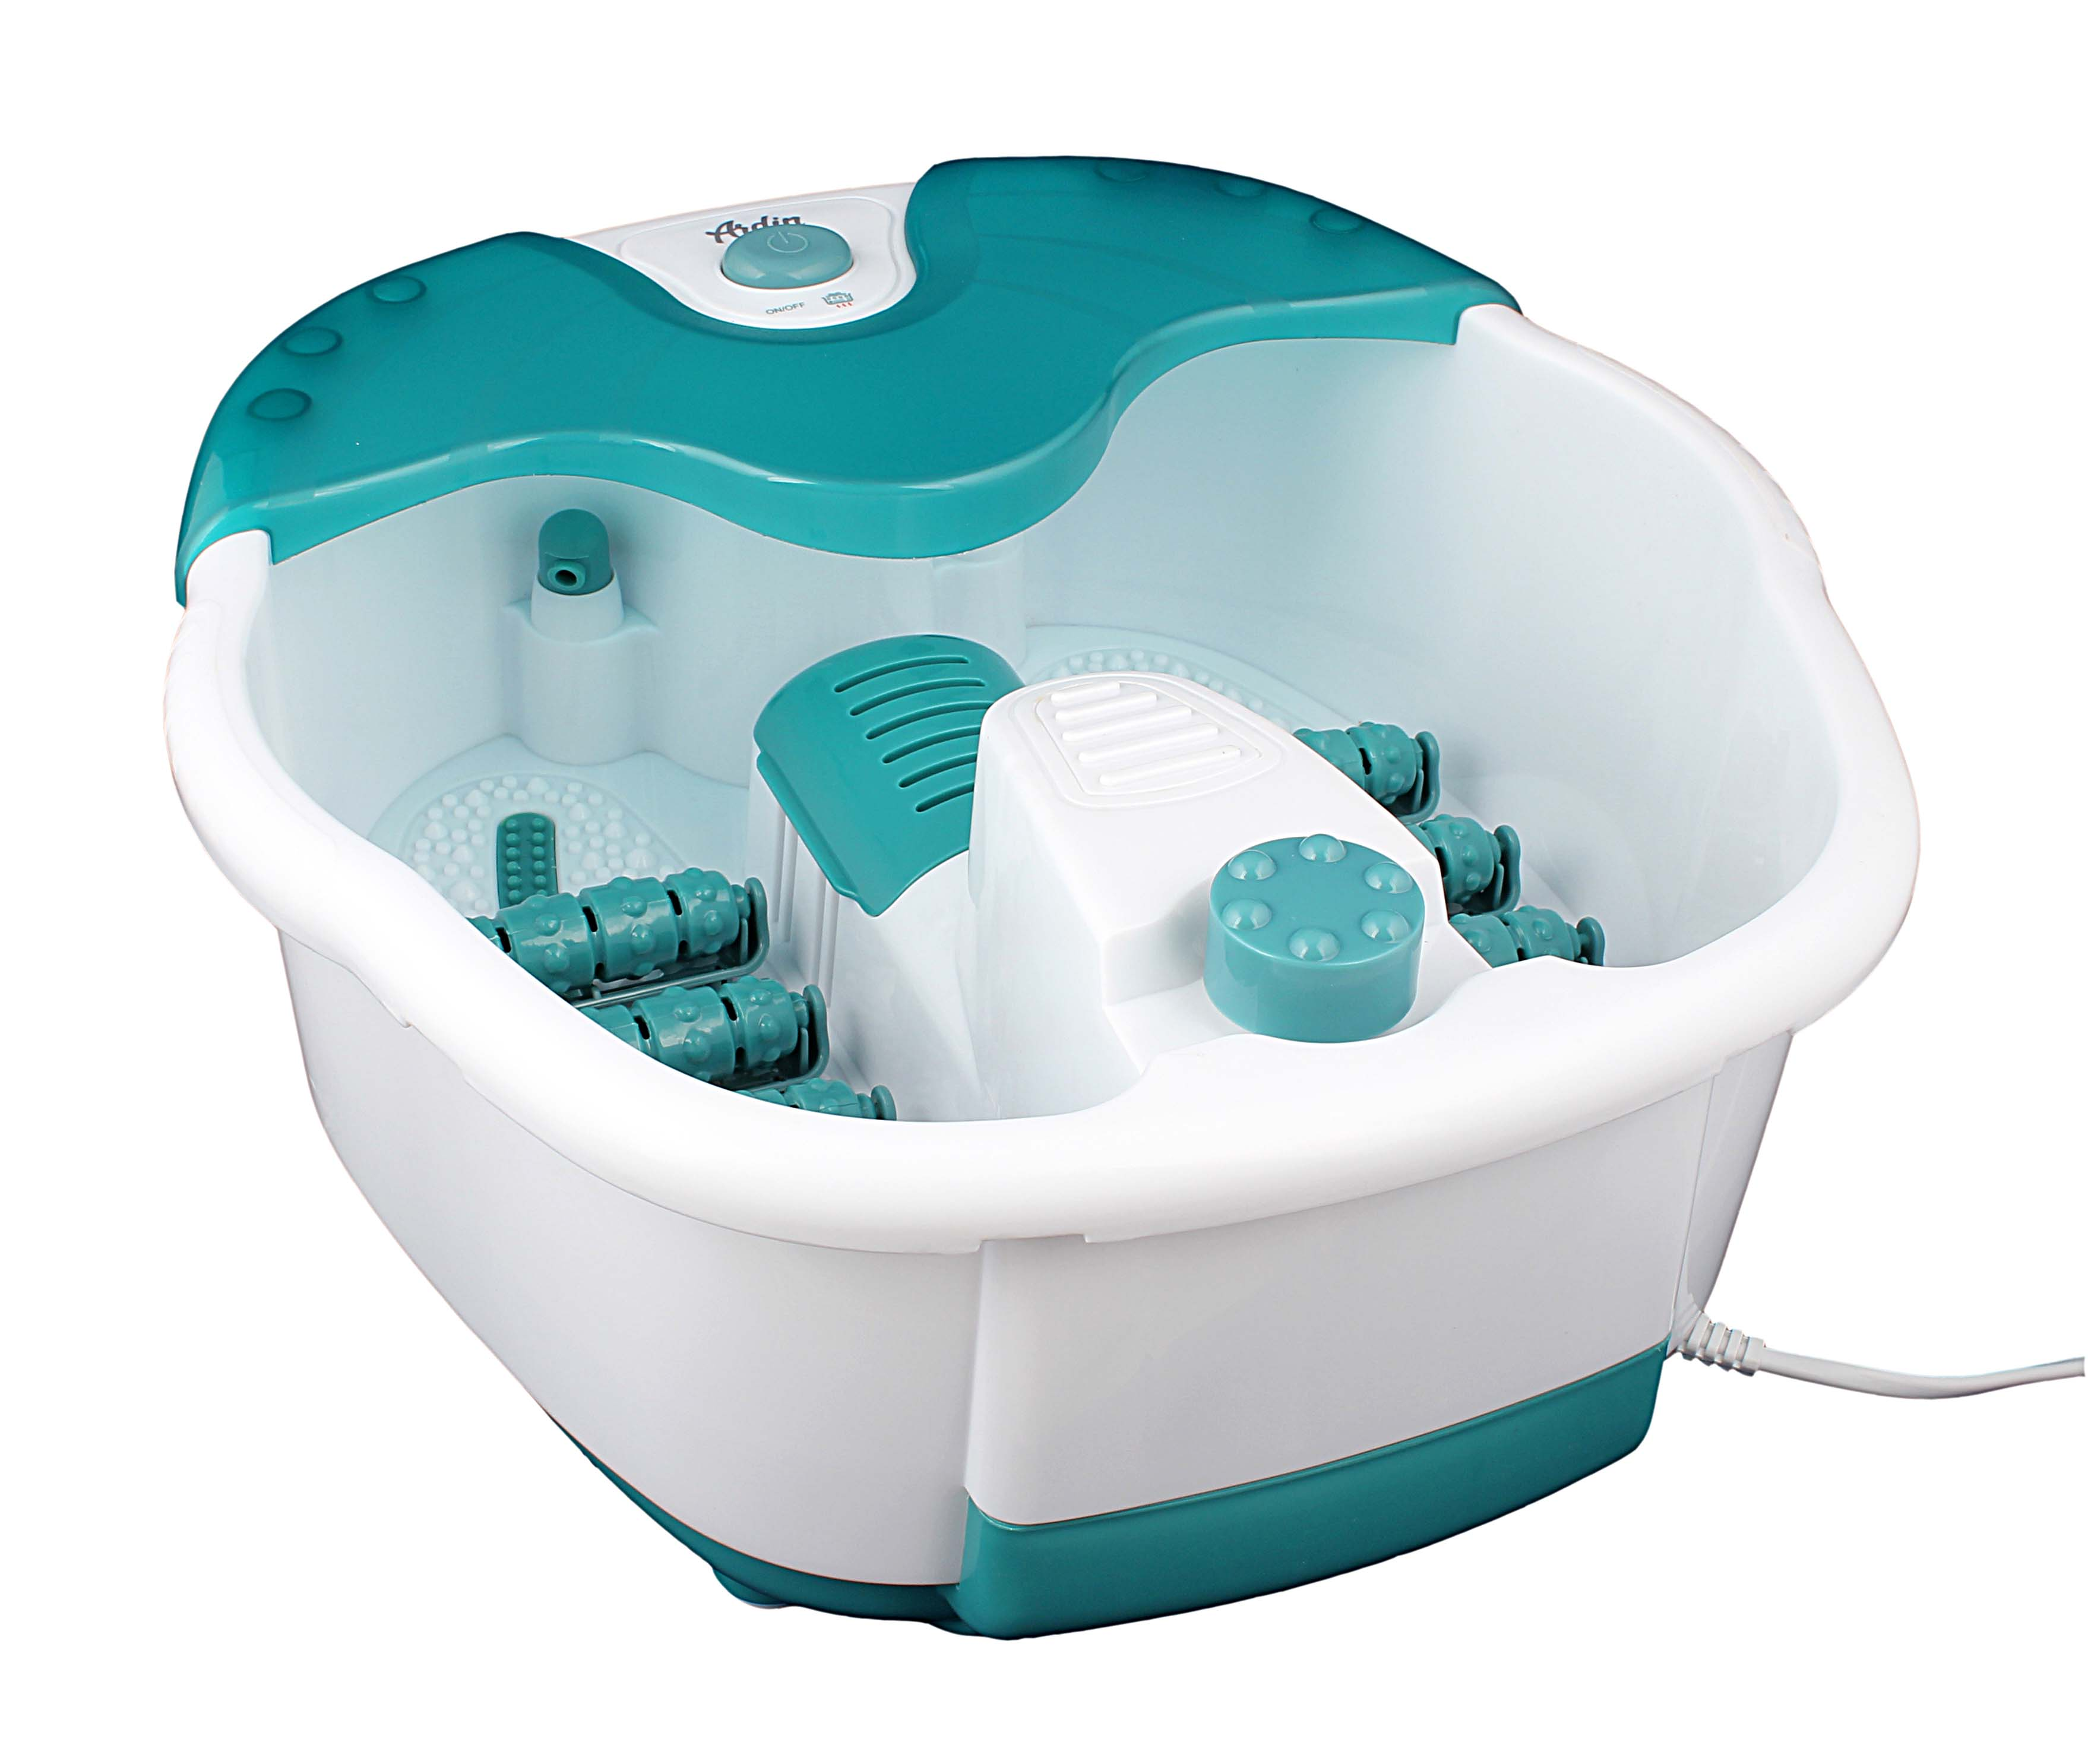 Массажные ванны Ardin Real Brand Technics 2499.000